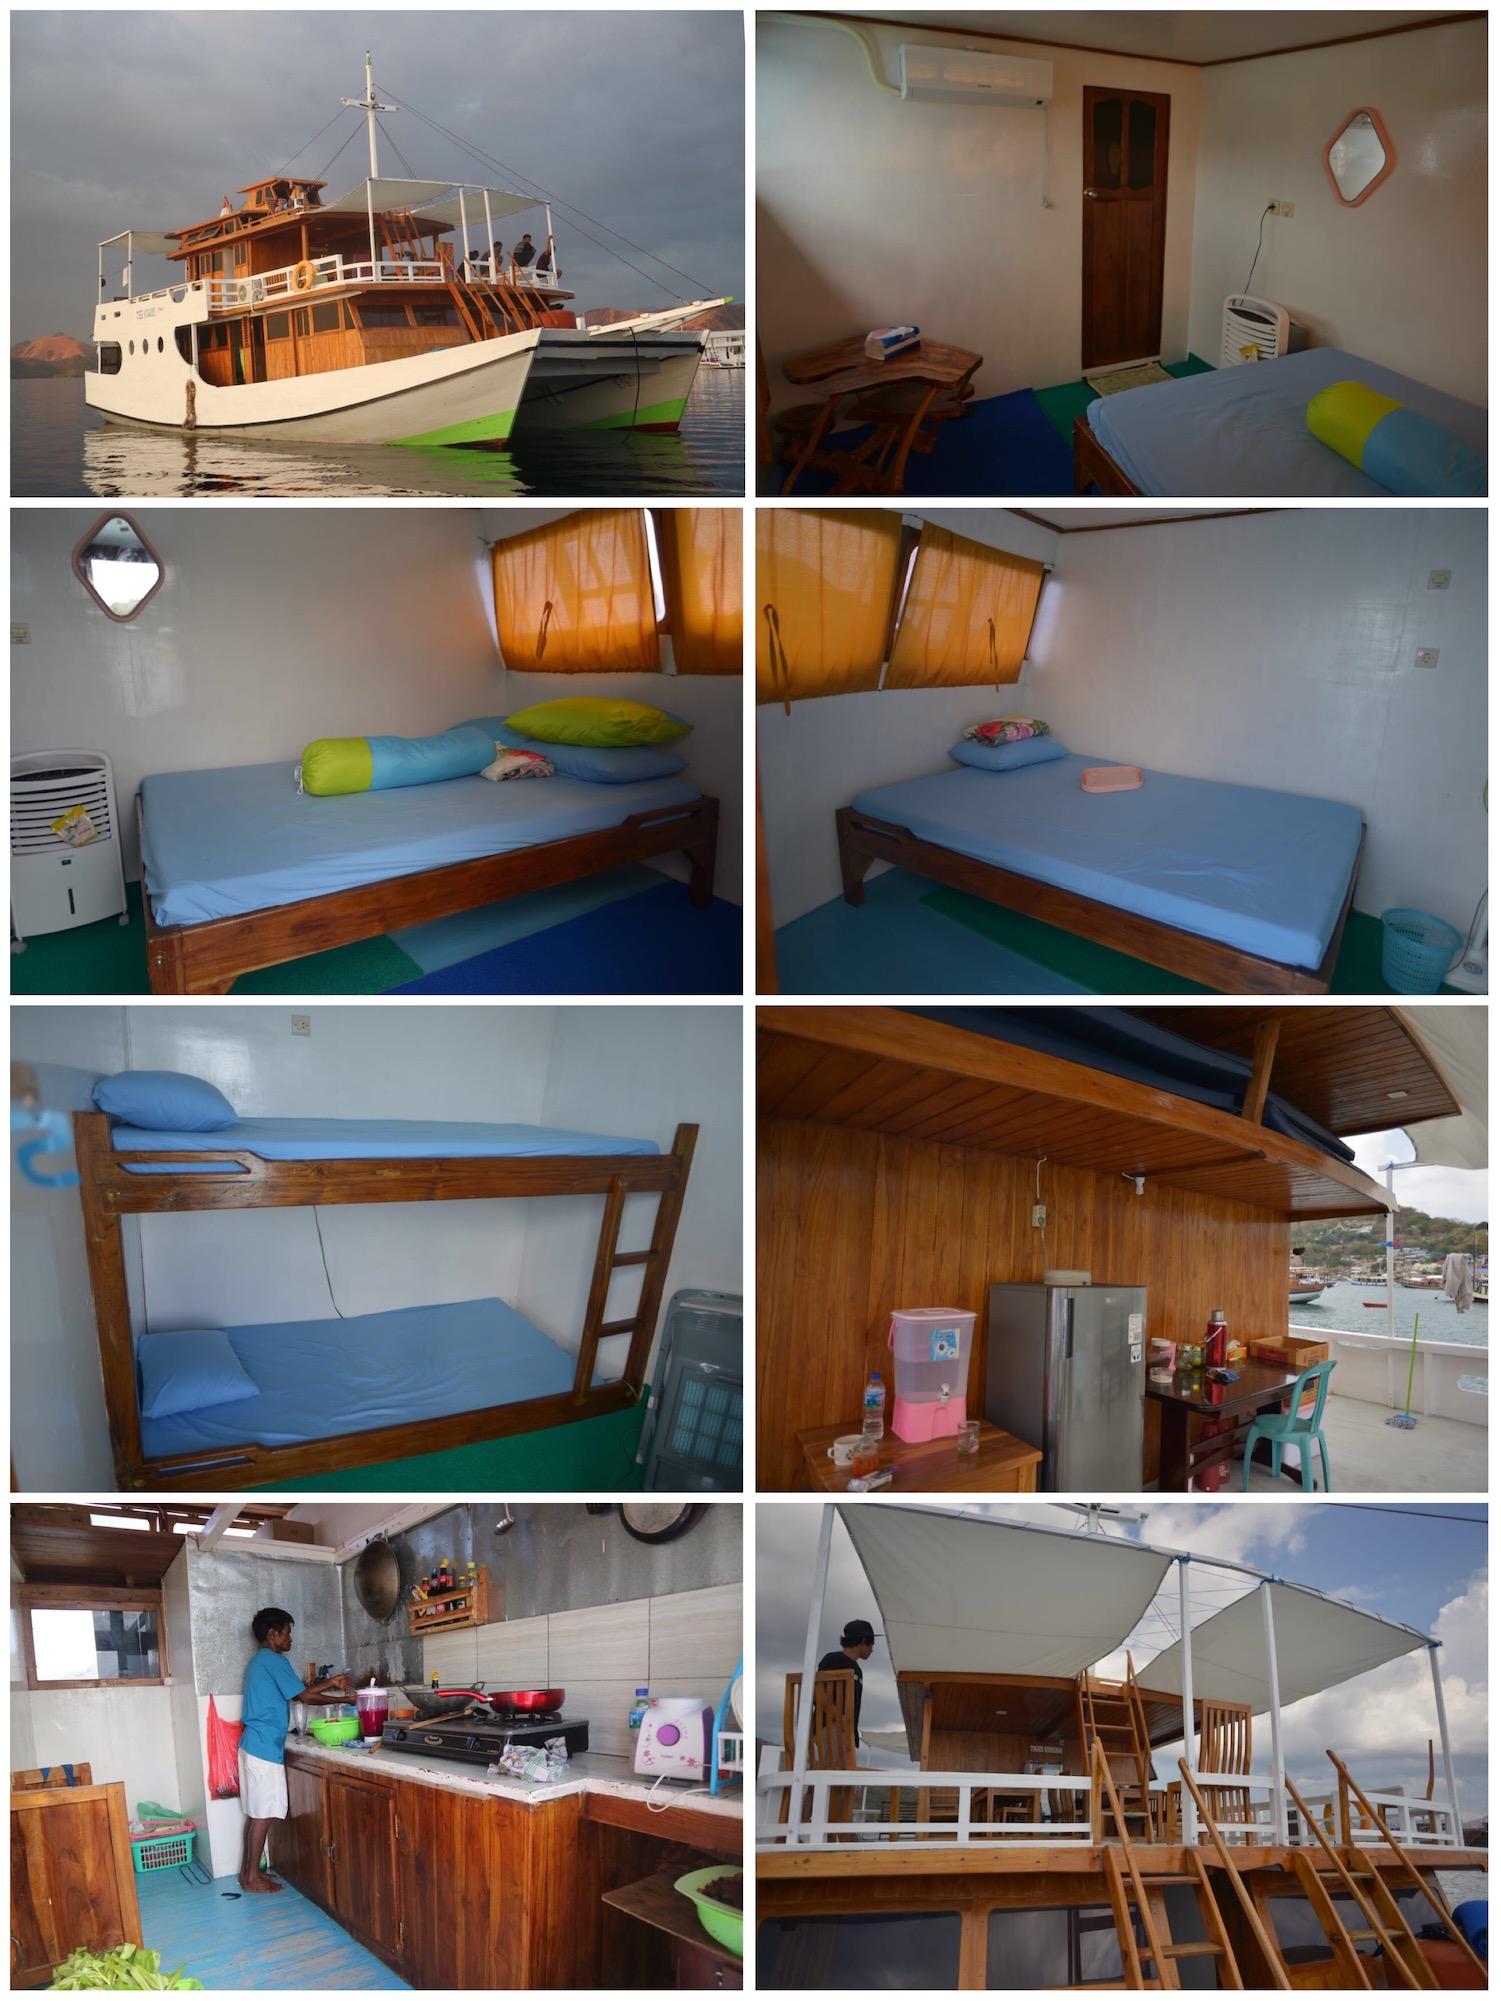 Flores boat cruise, labuan bajo day trip, komodo trip schedule 2018 2019, komodo dragon tours, komodo liveaboard, sharing tour komodo, how to get to komodo island.